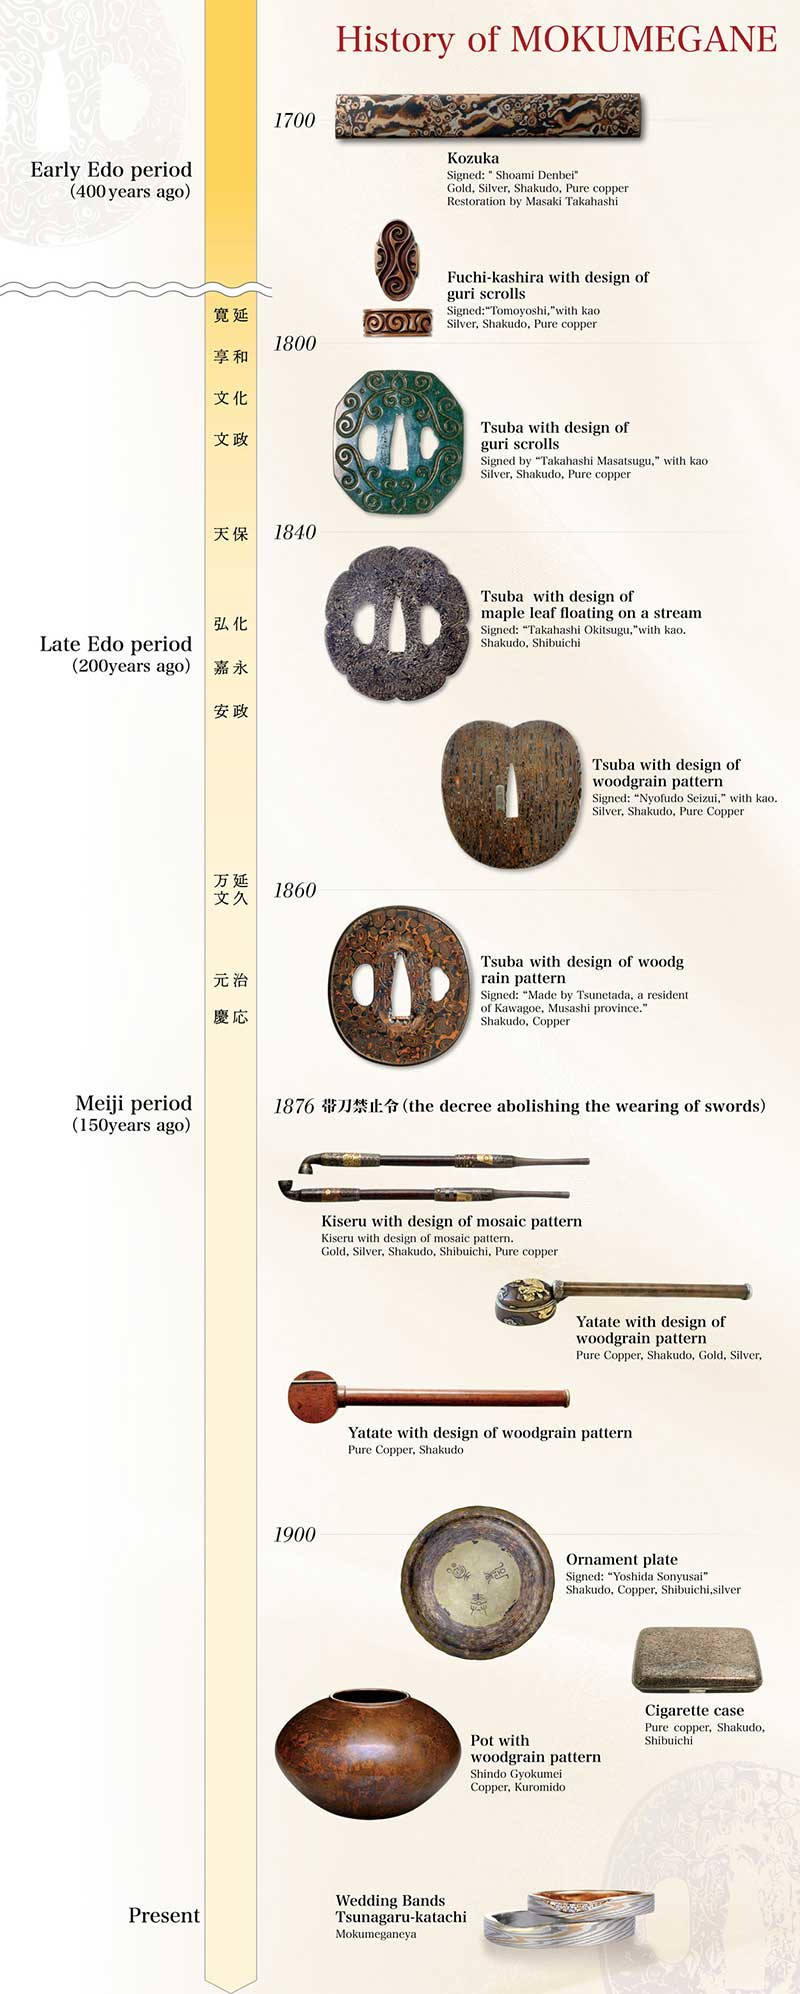 Mokumegane History